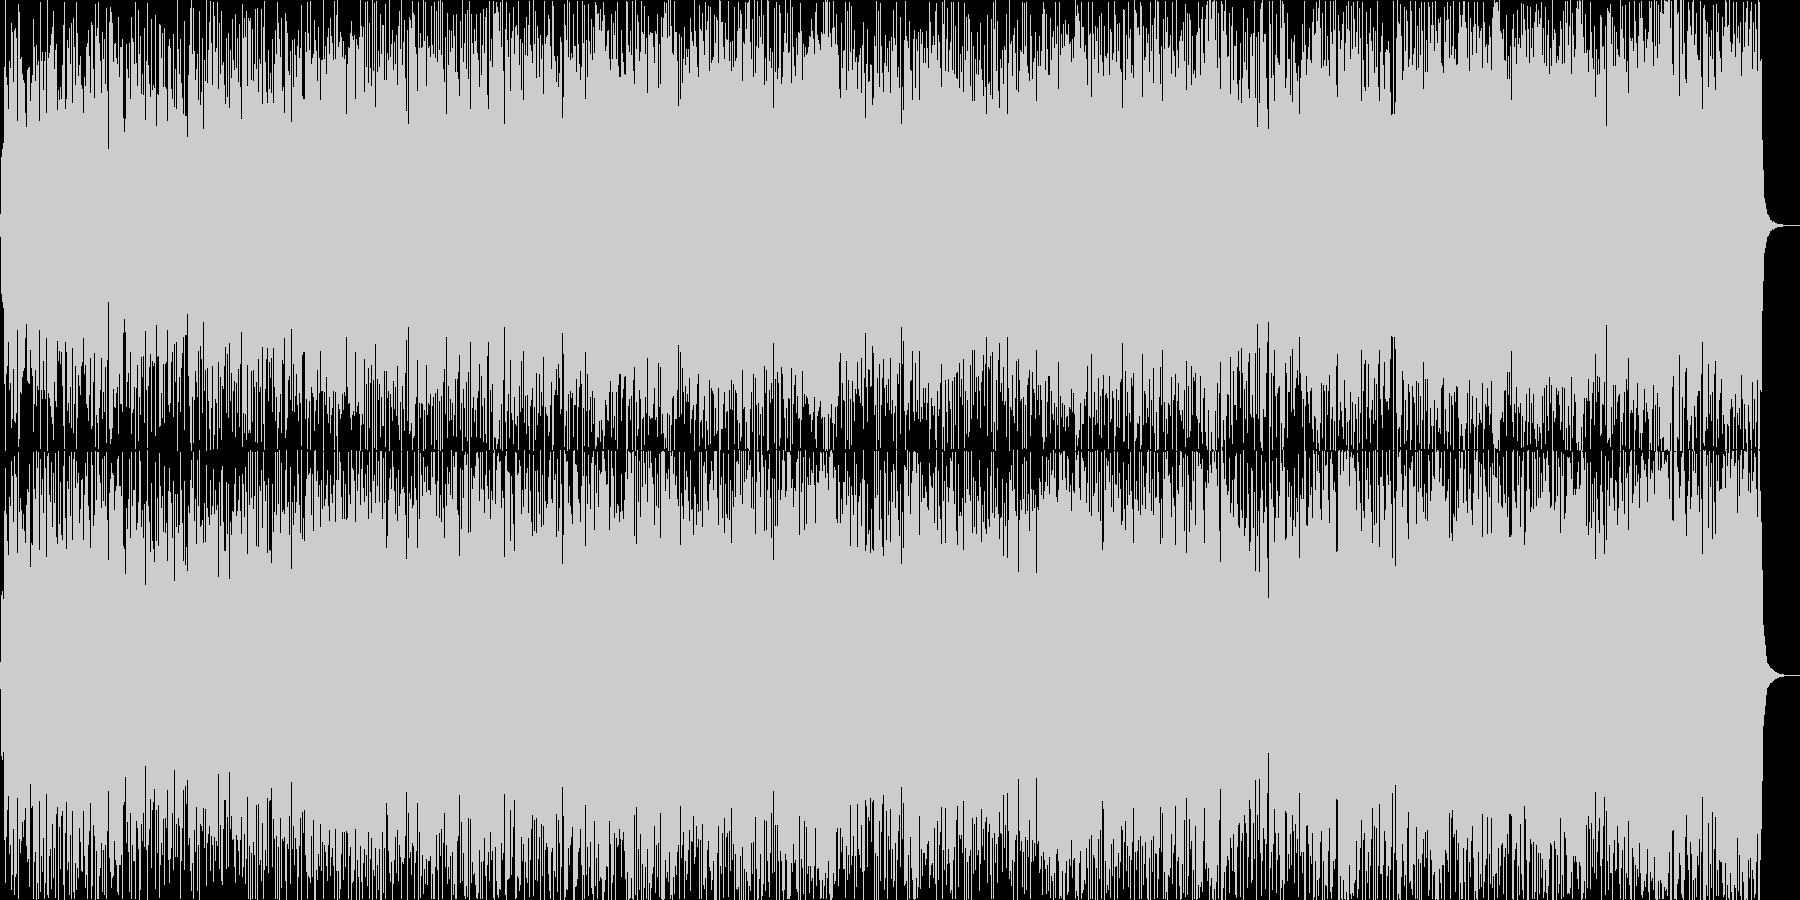 Jolly Fluteの未再生の波形